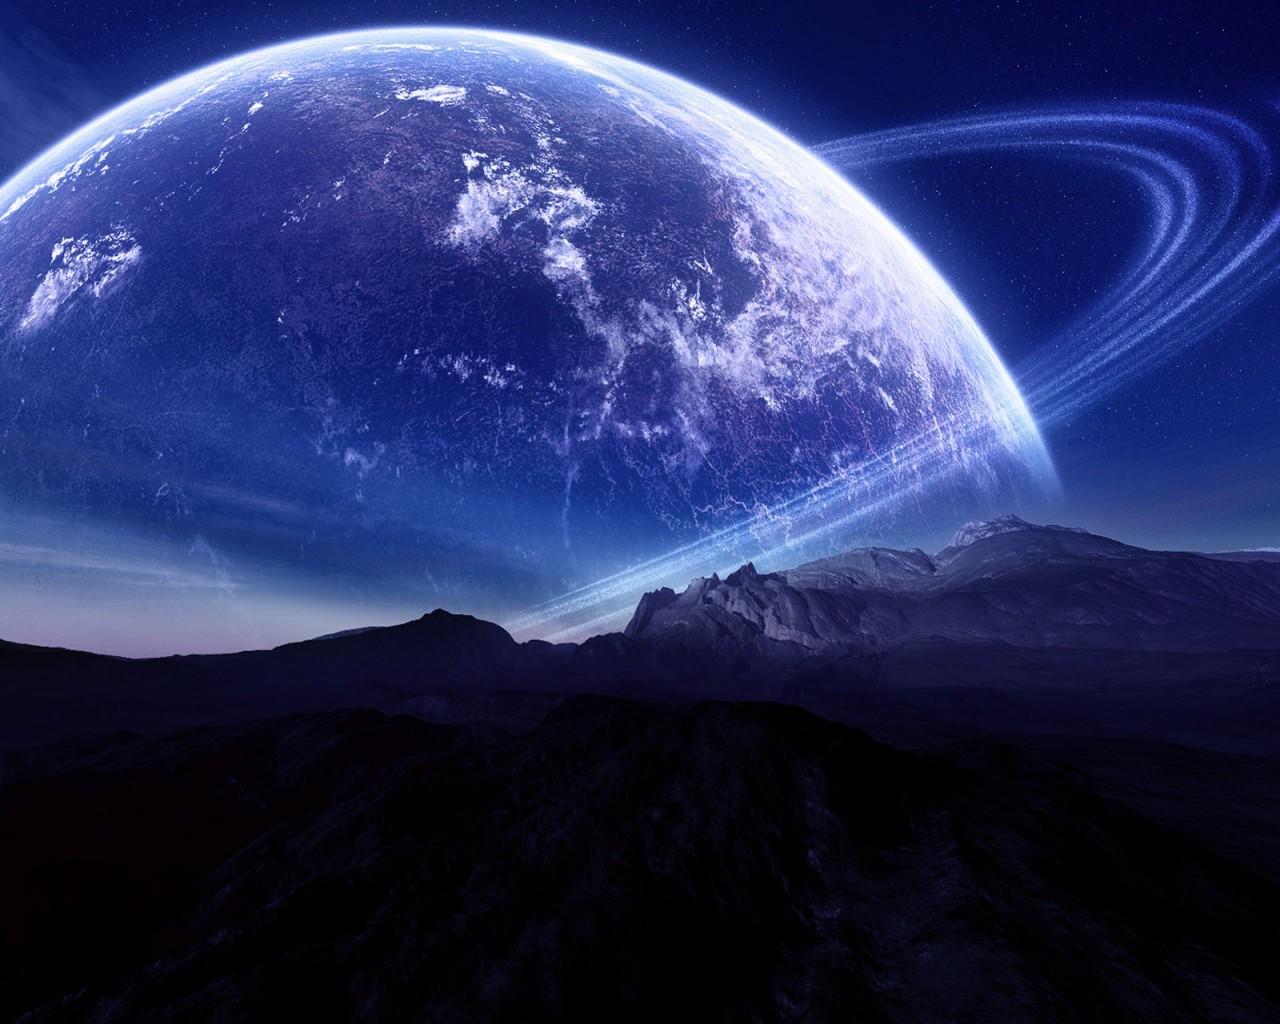 Hd Earth Wallpaper Widescreen Planet Closer Look Wallpapers Hd Wallpapers Id 3864